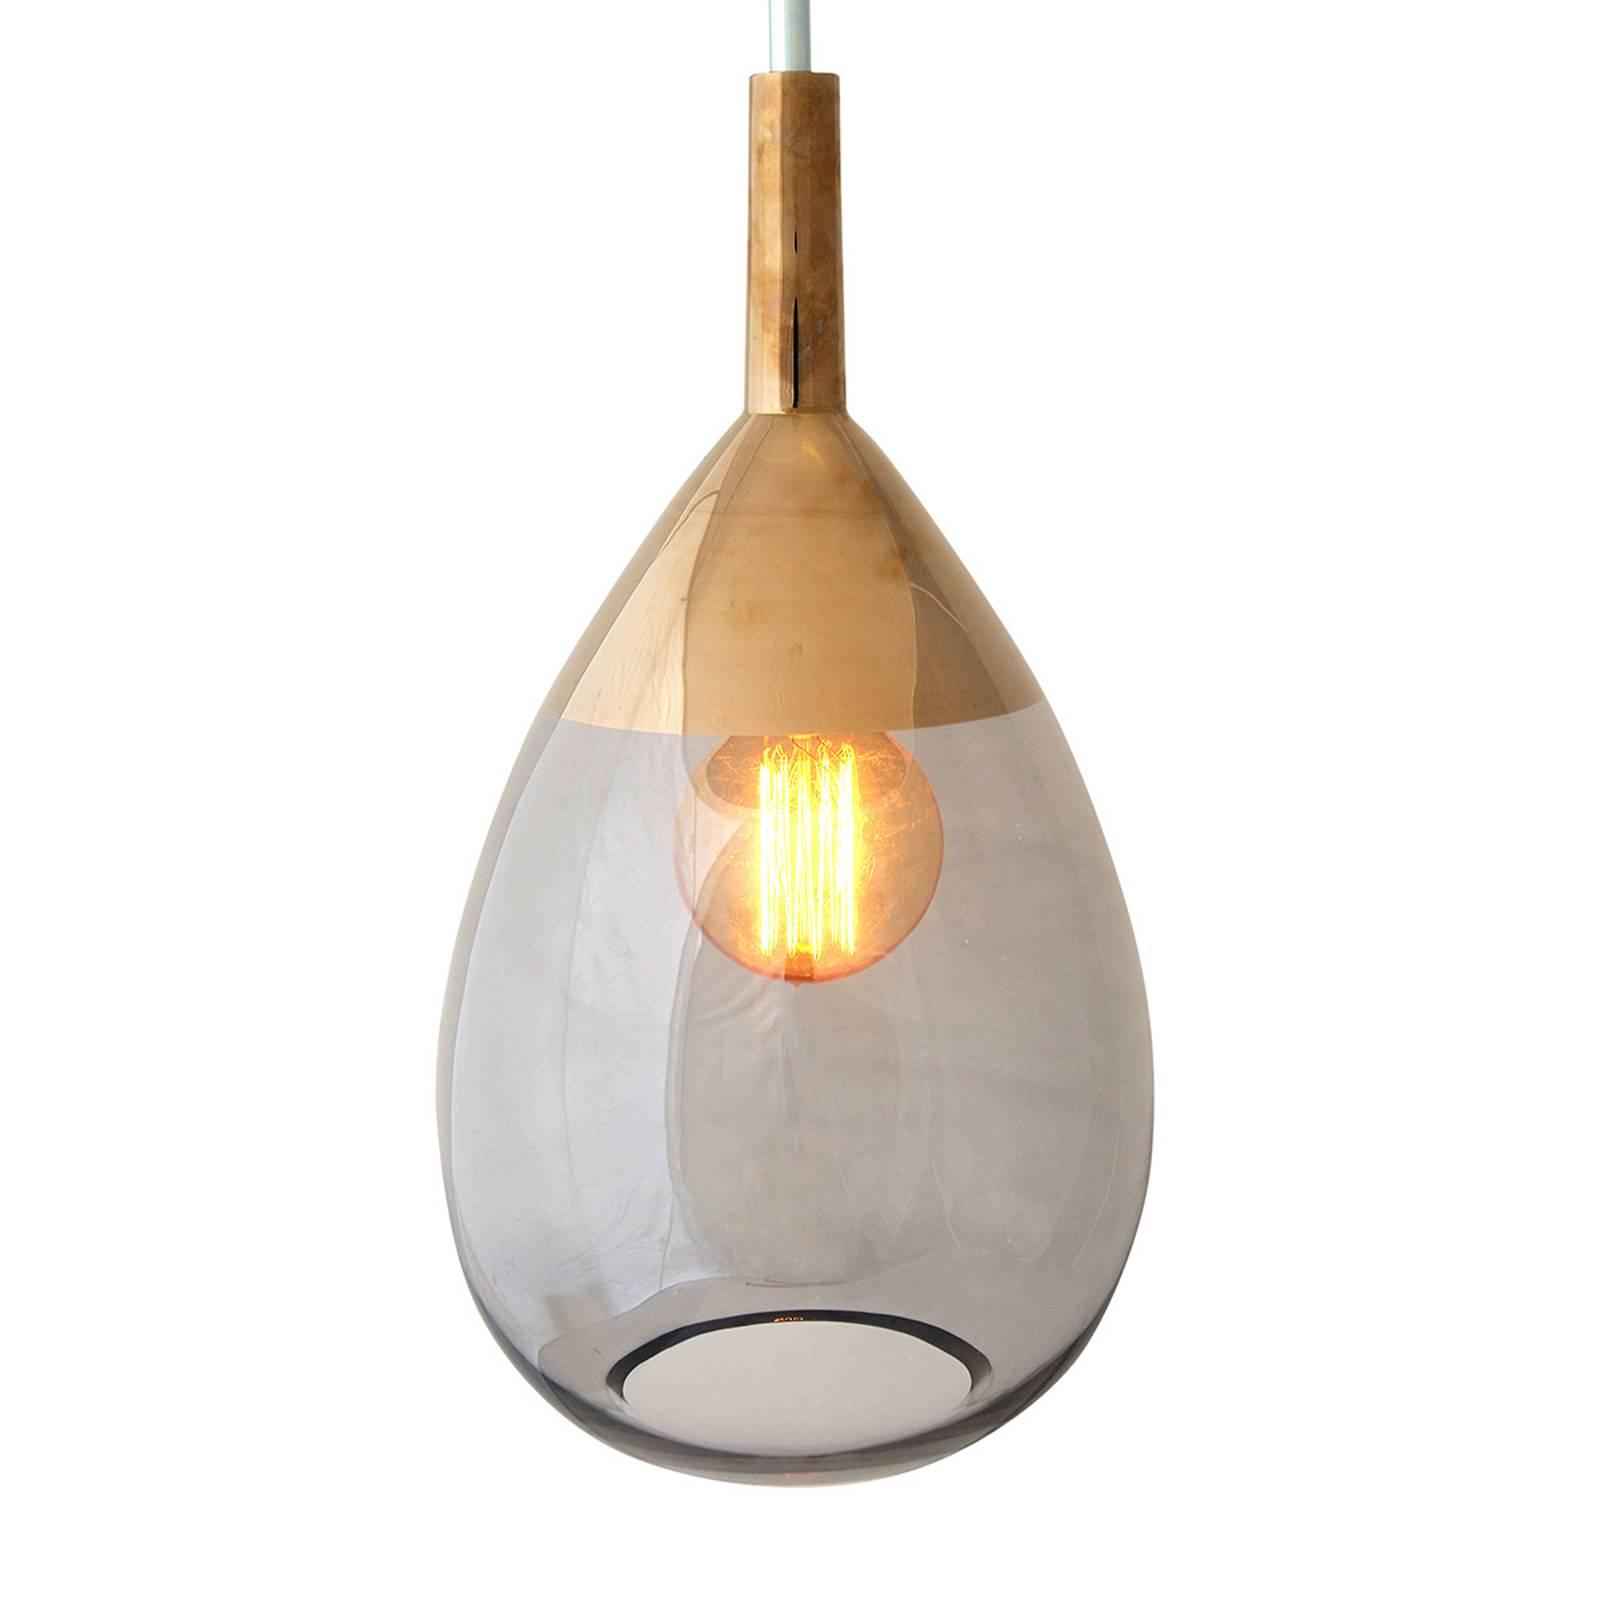 EBB & FLOW Lute hanglamp platina, glas grijs